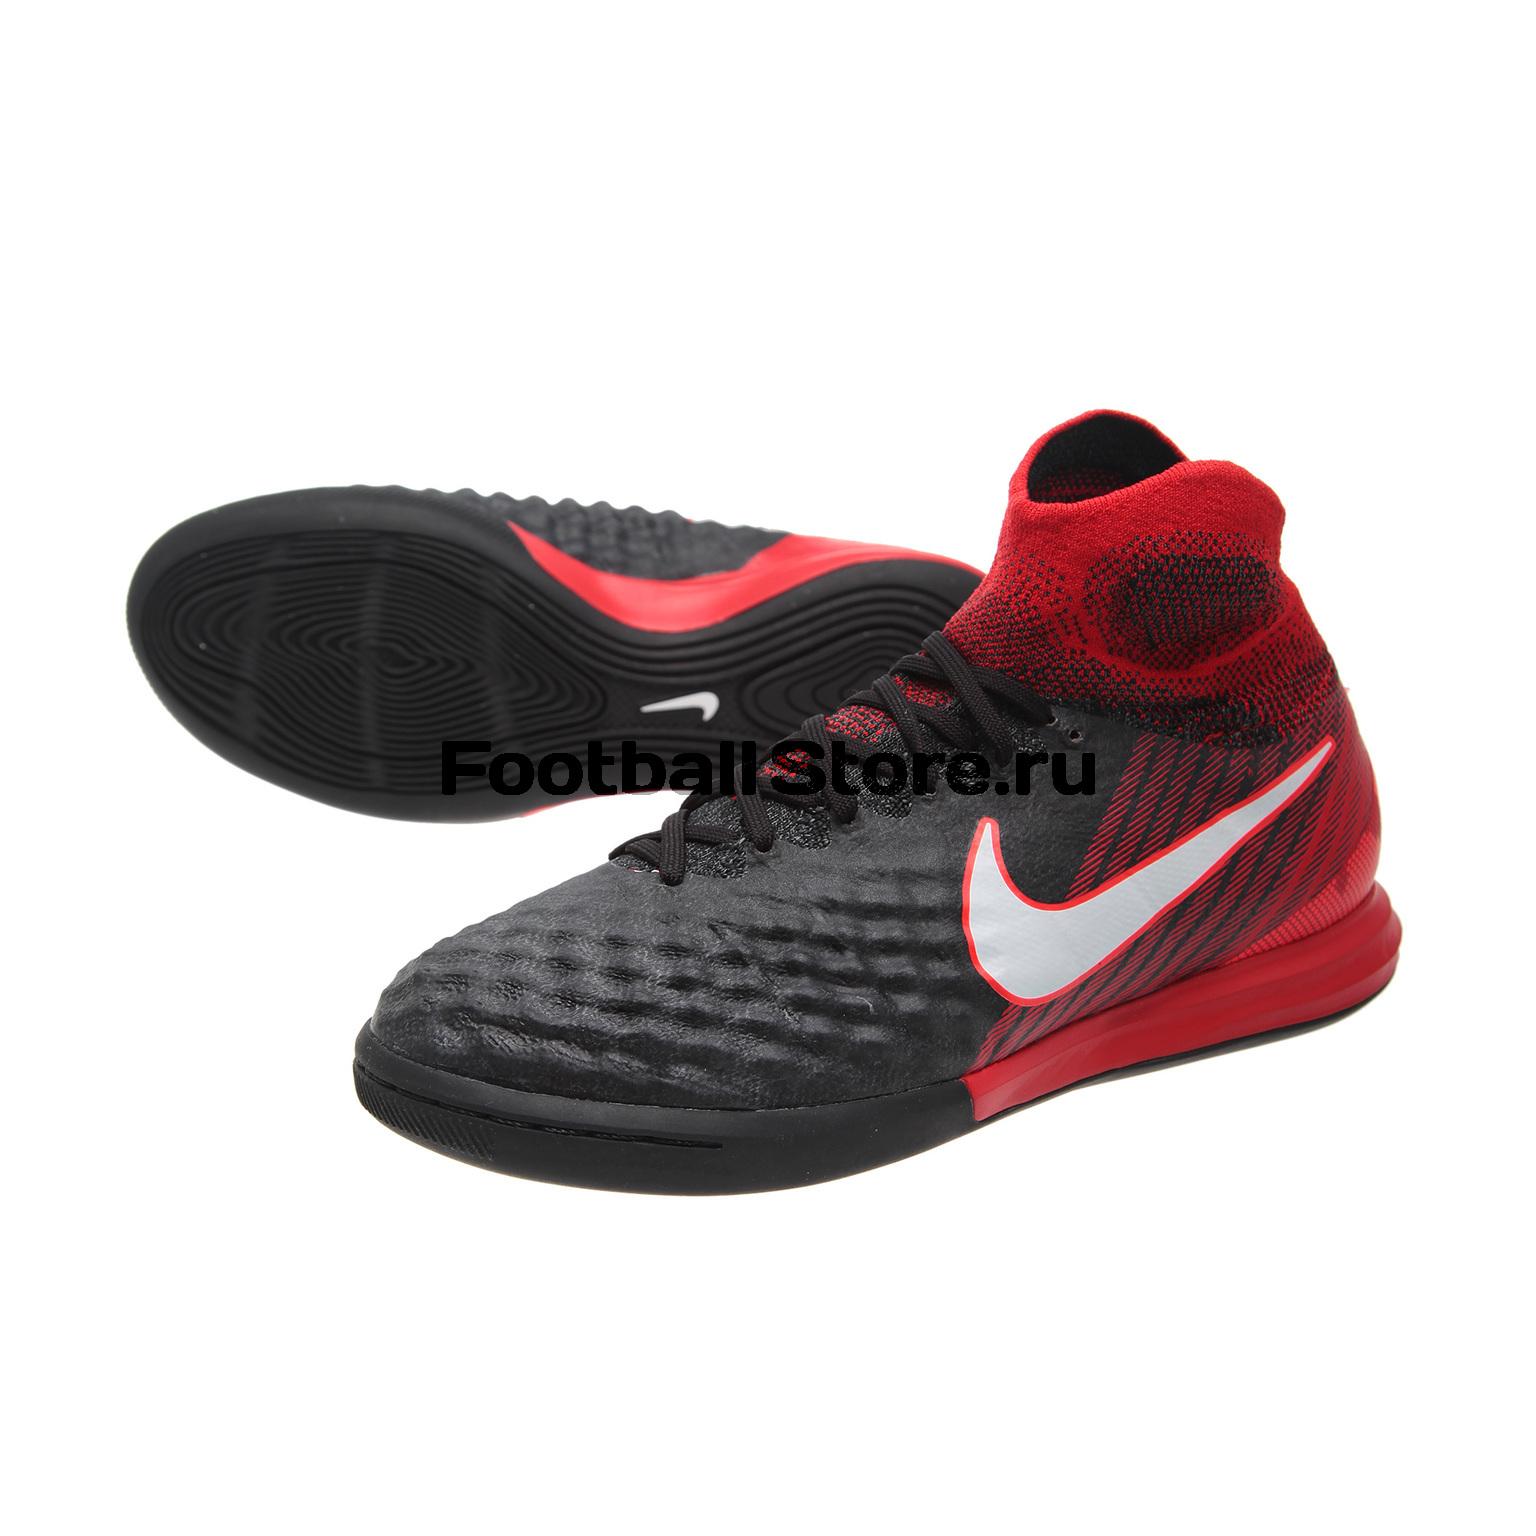 9401f76f Футзалки детские Nike Magista Proximo II IC 843955-061 – купить в ...